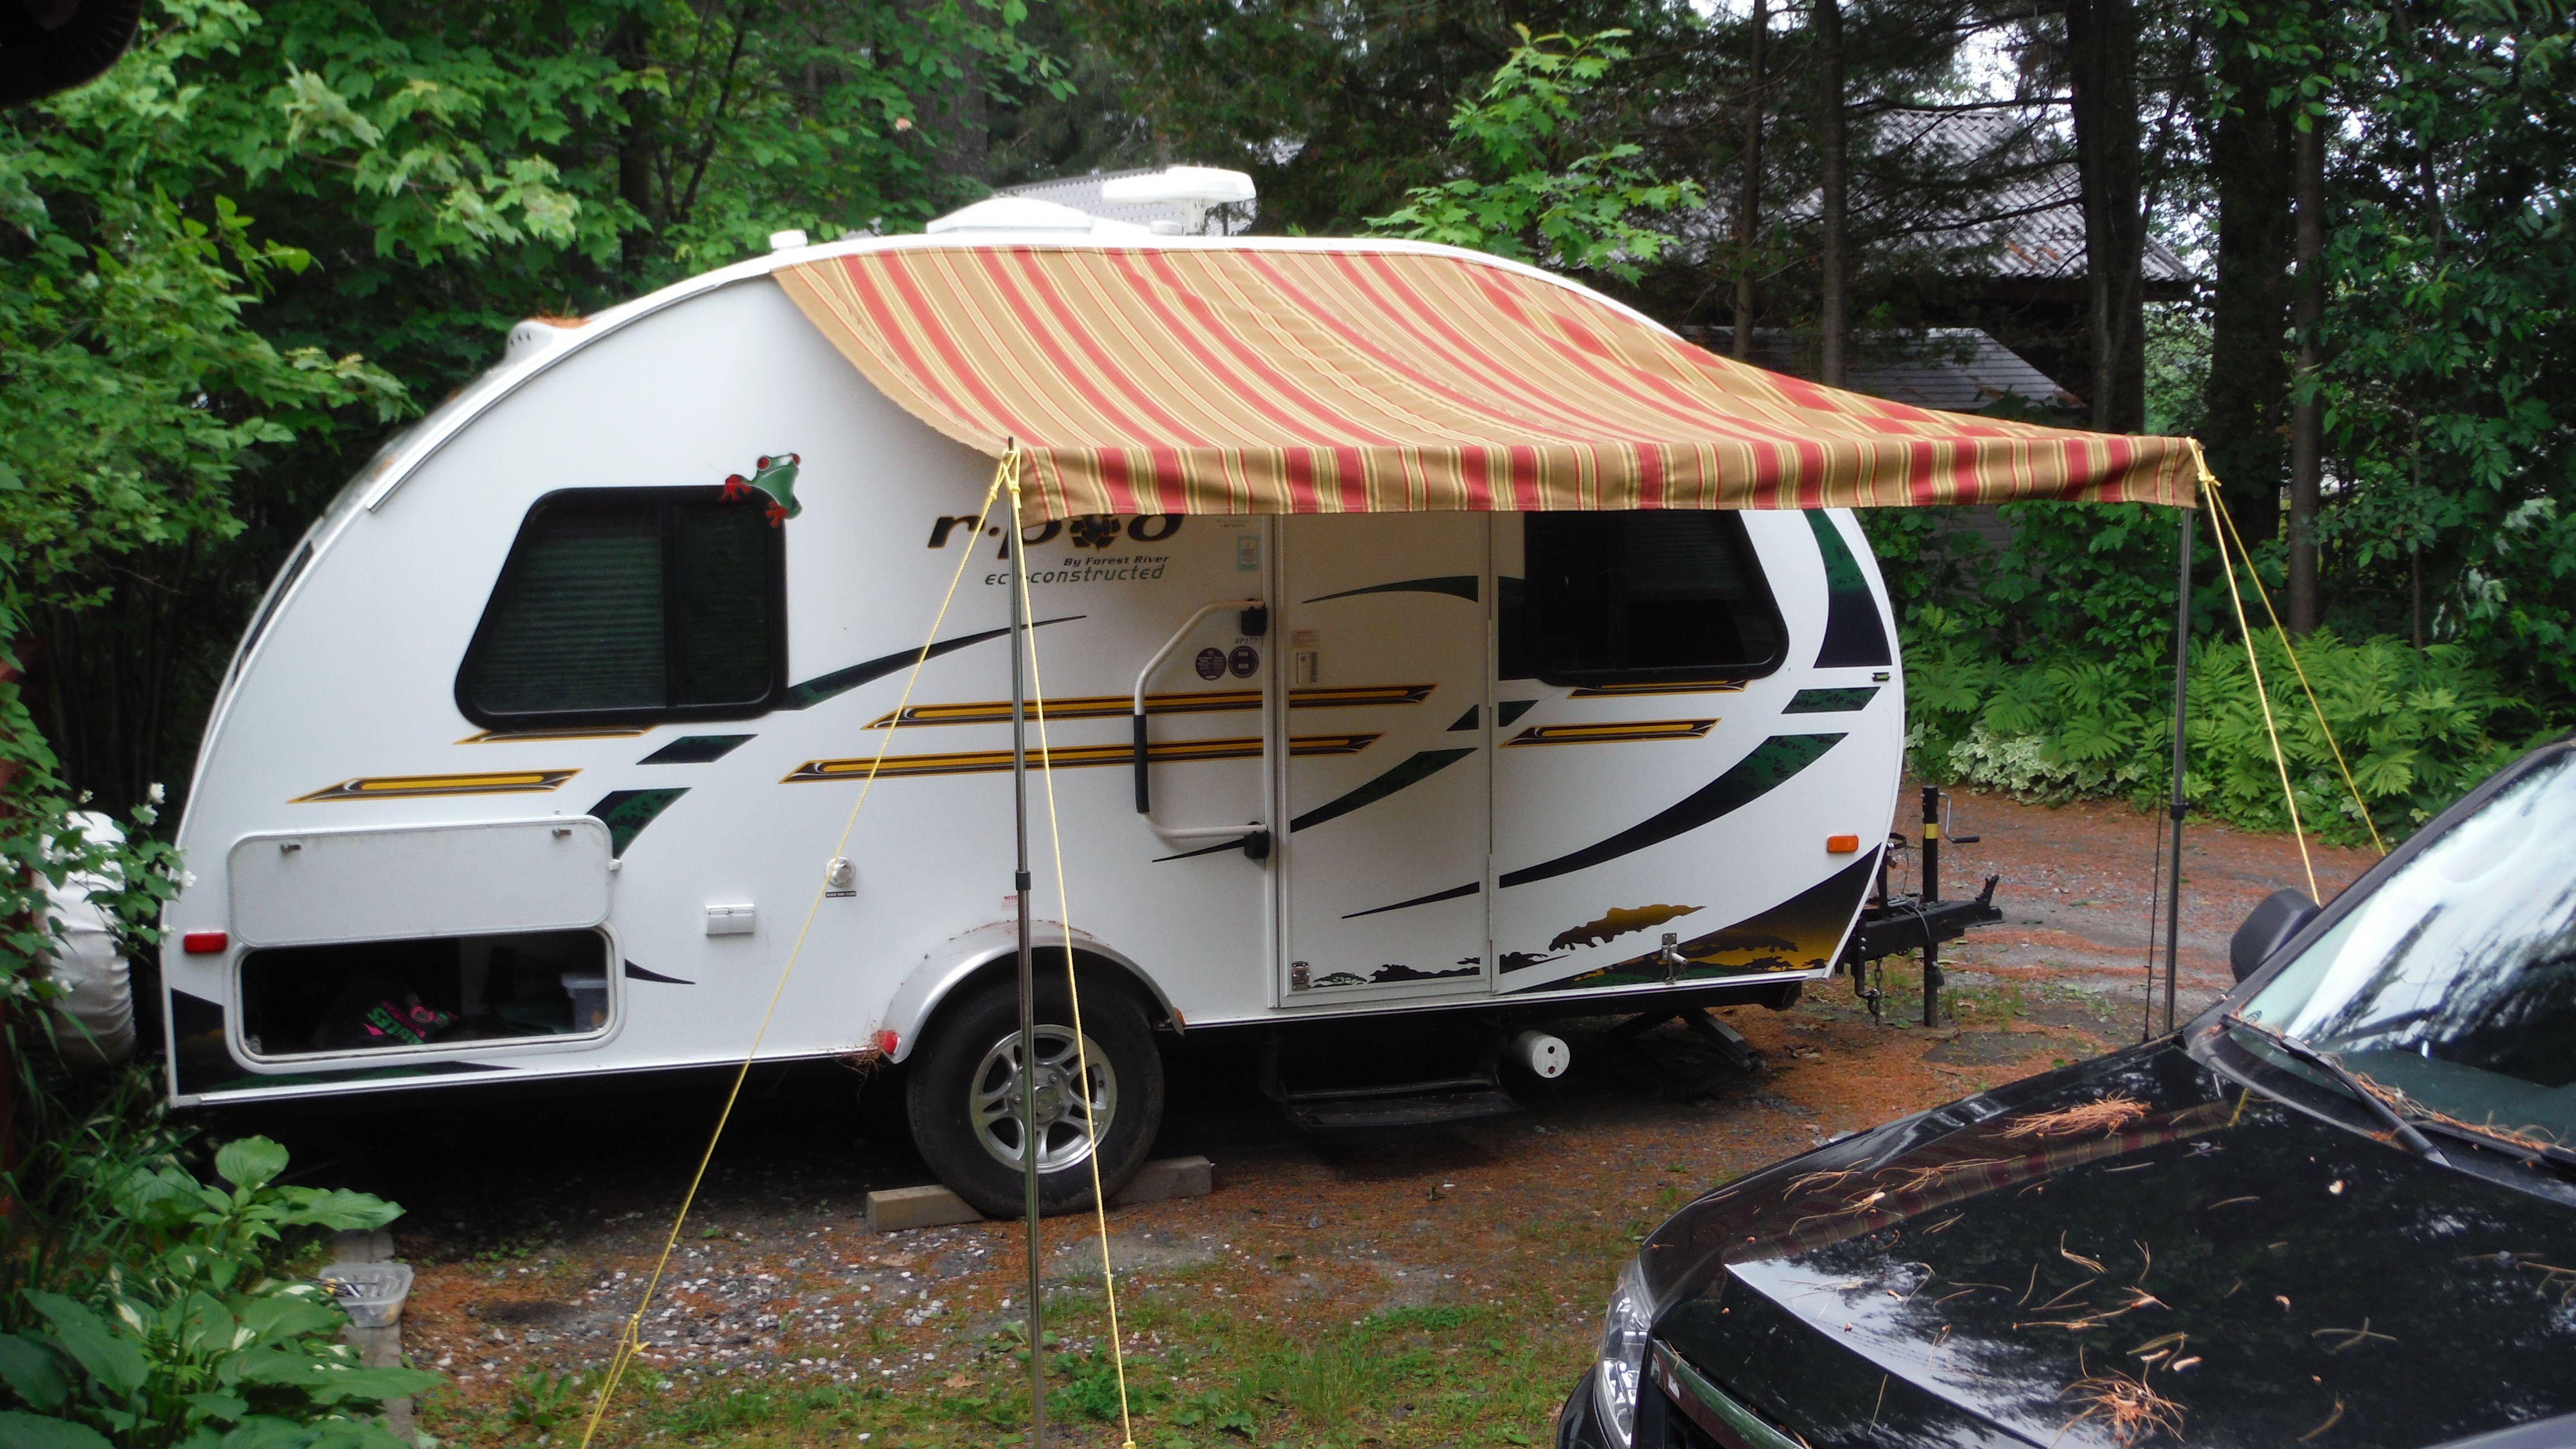 Diy Awning R Pod Ideas Camper Rv Campers Diy Awning